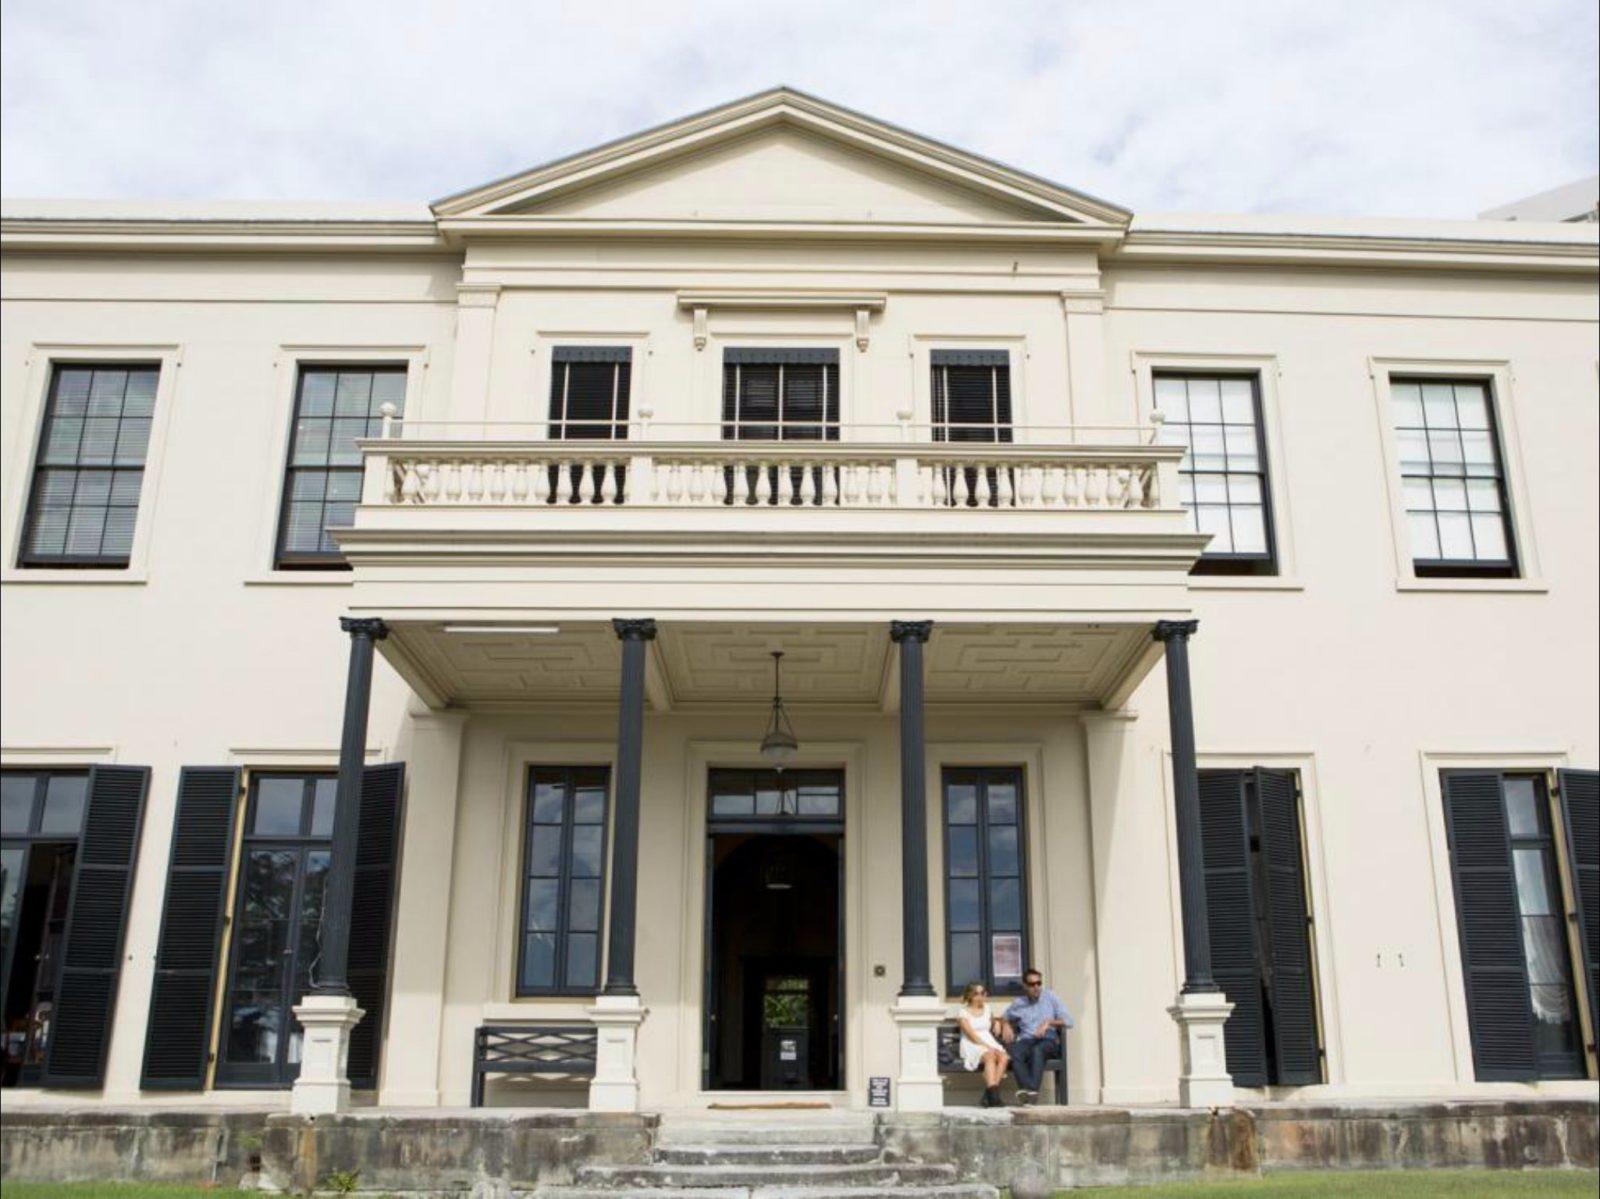 The impressive facade of Elizabeth Bay House